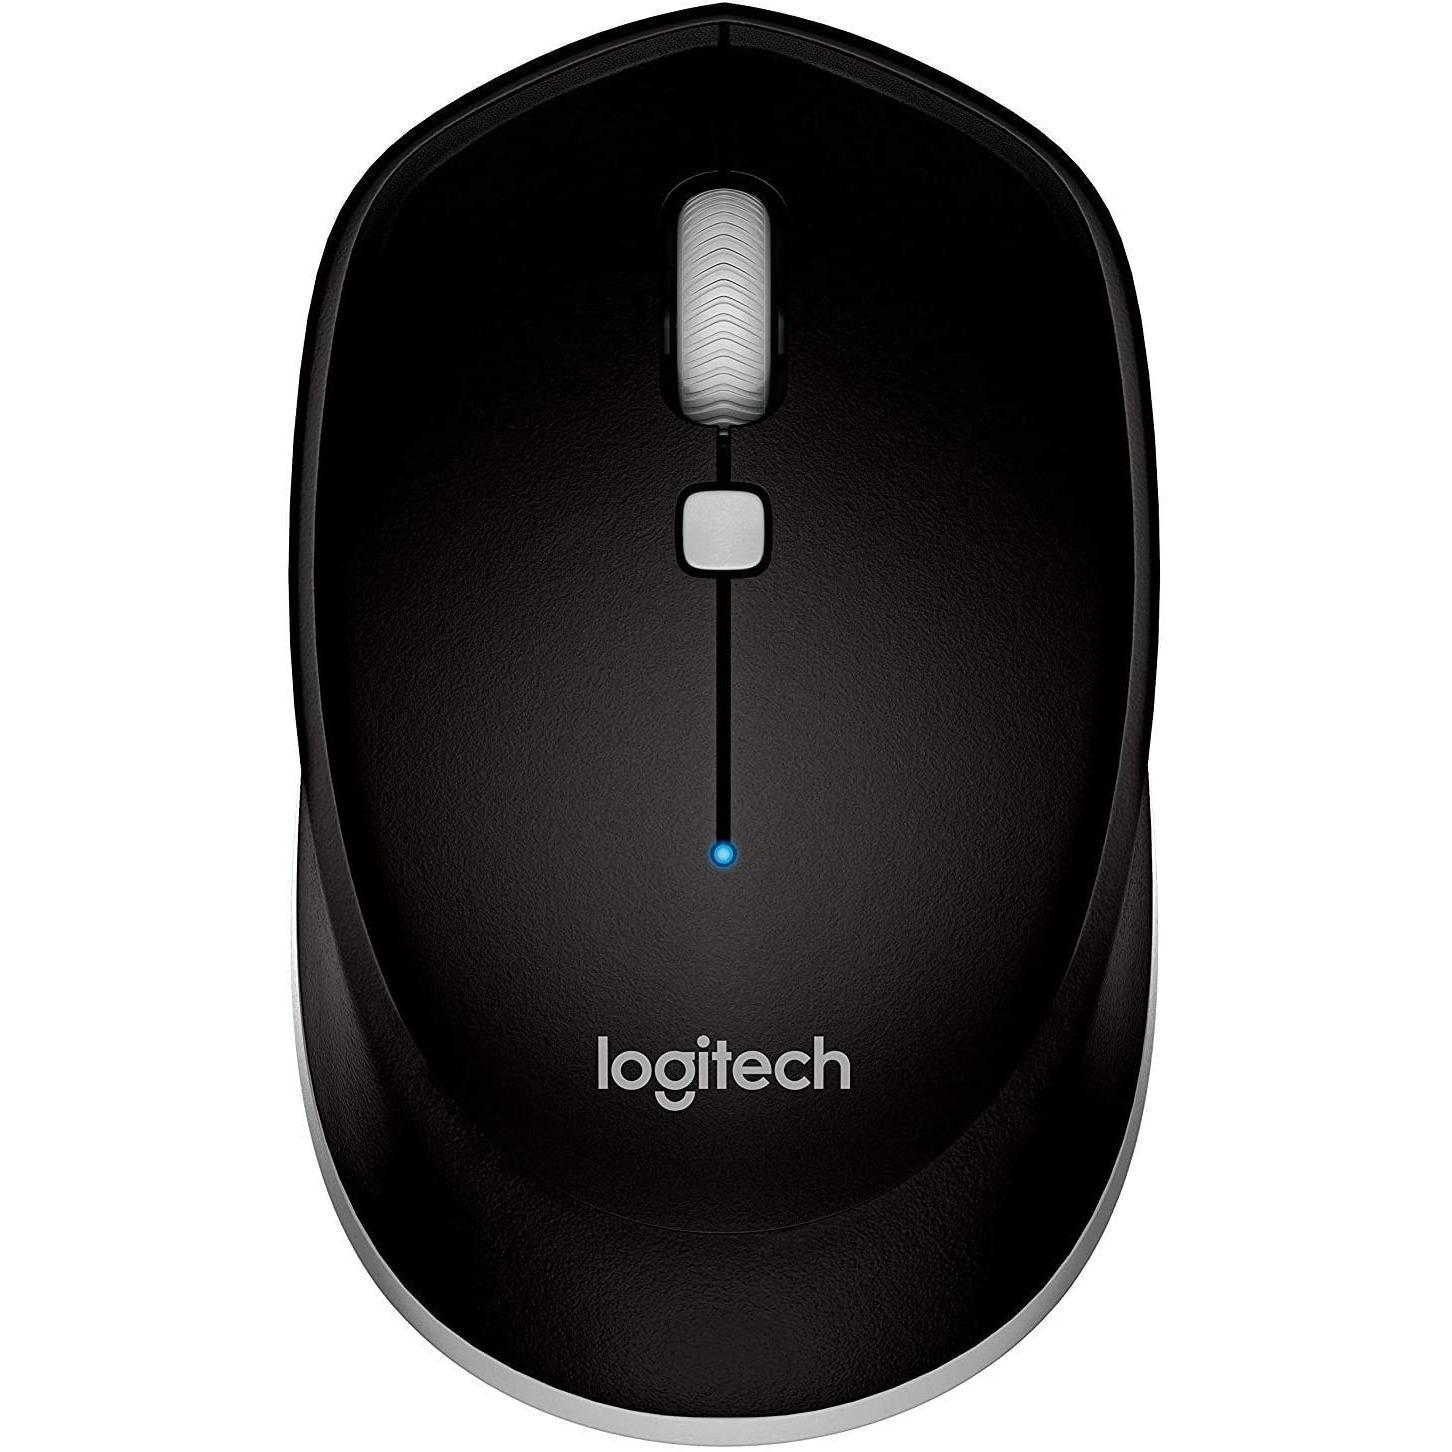 Logitech M535 Mouse Wireless